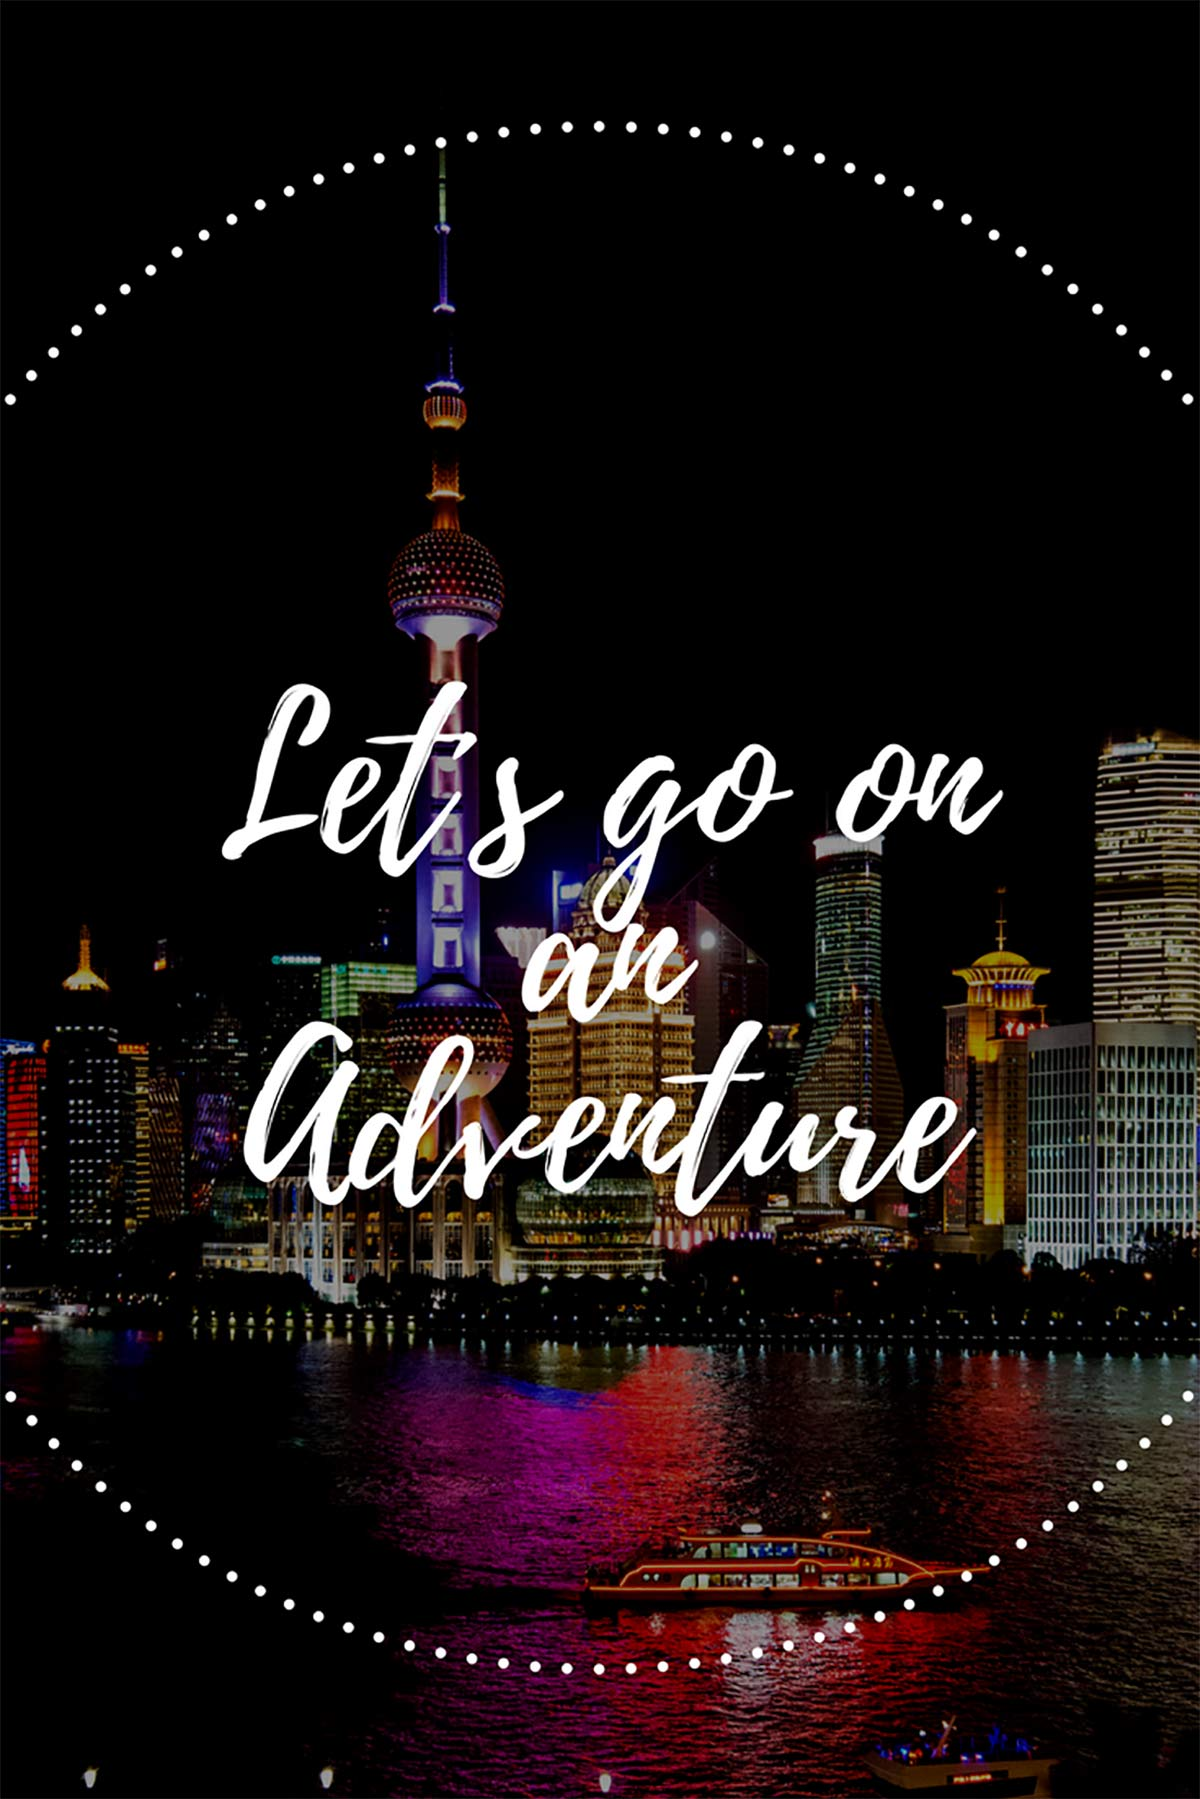 Let's go on an adventure!